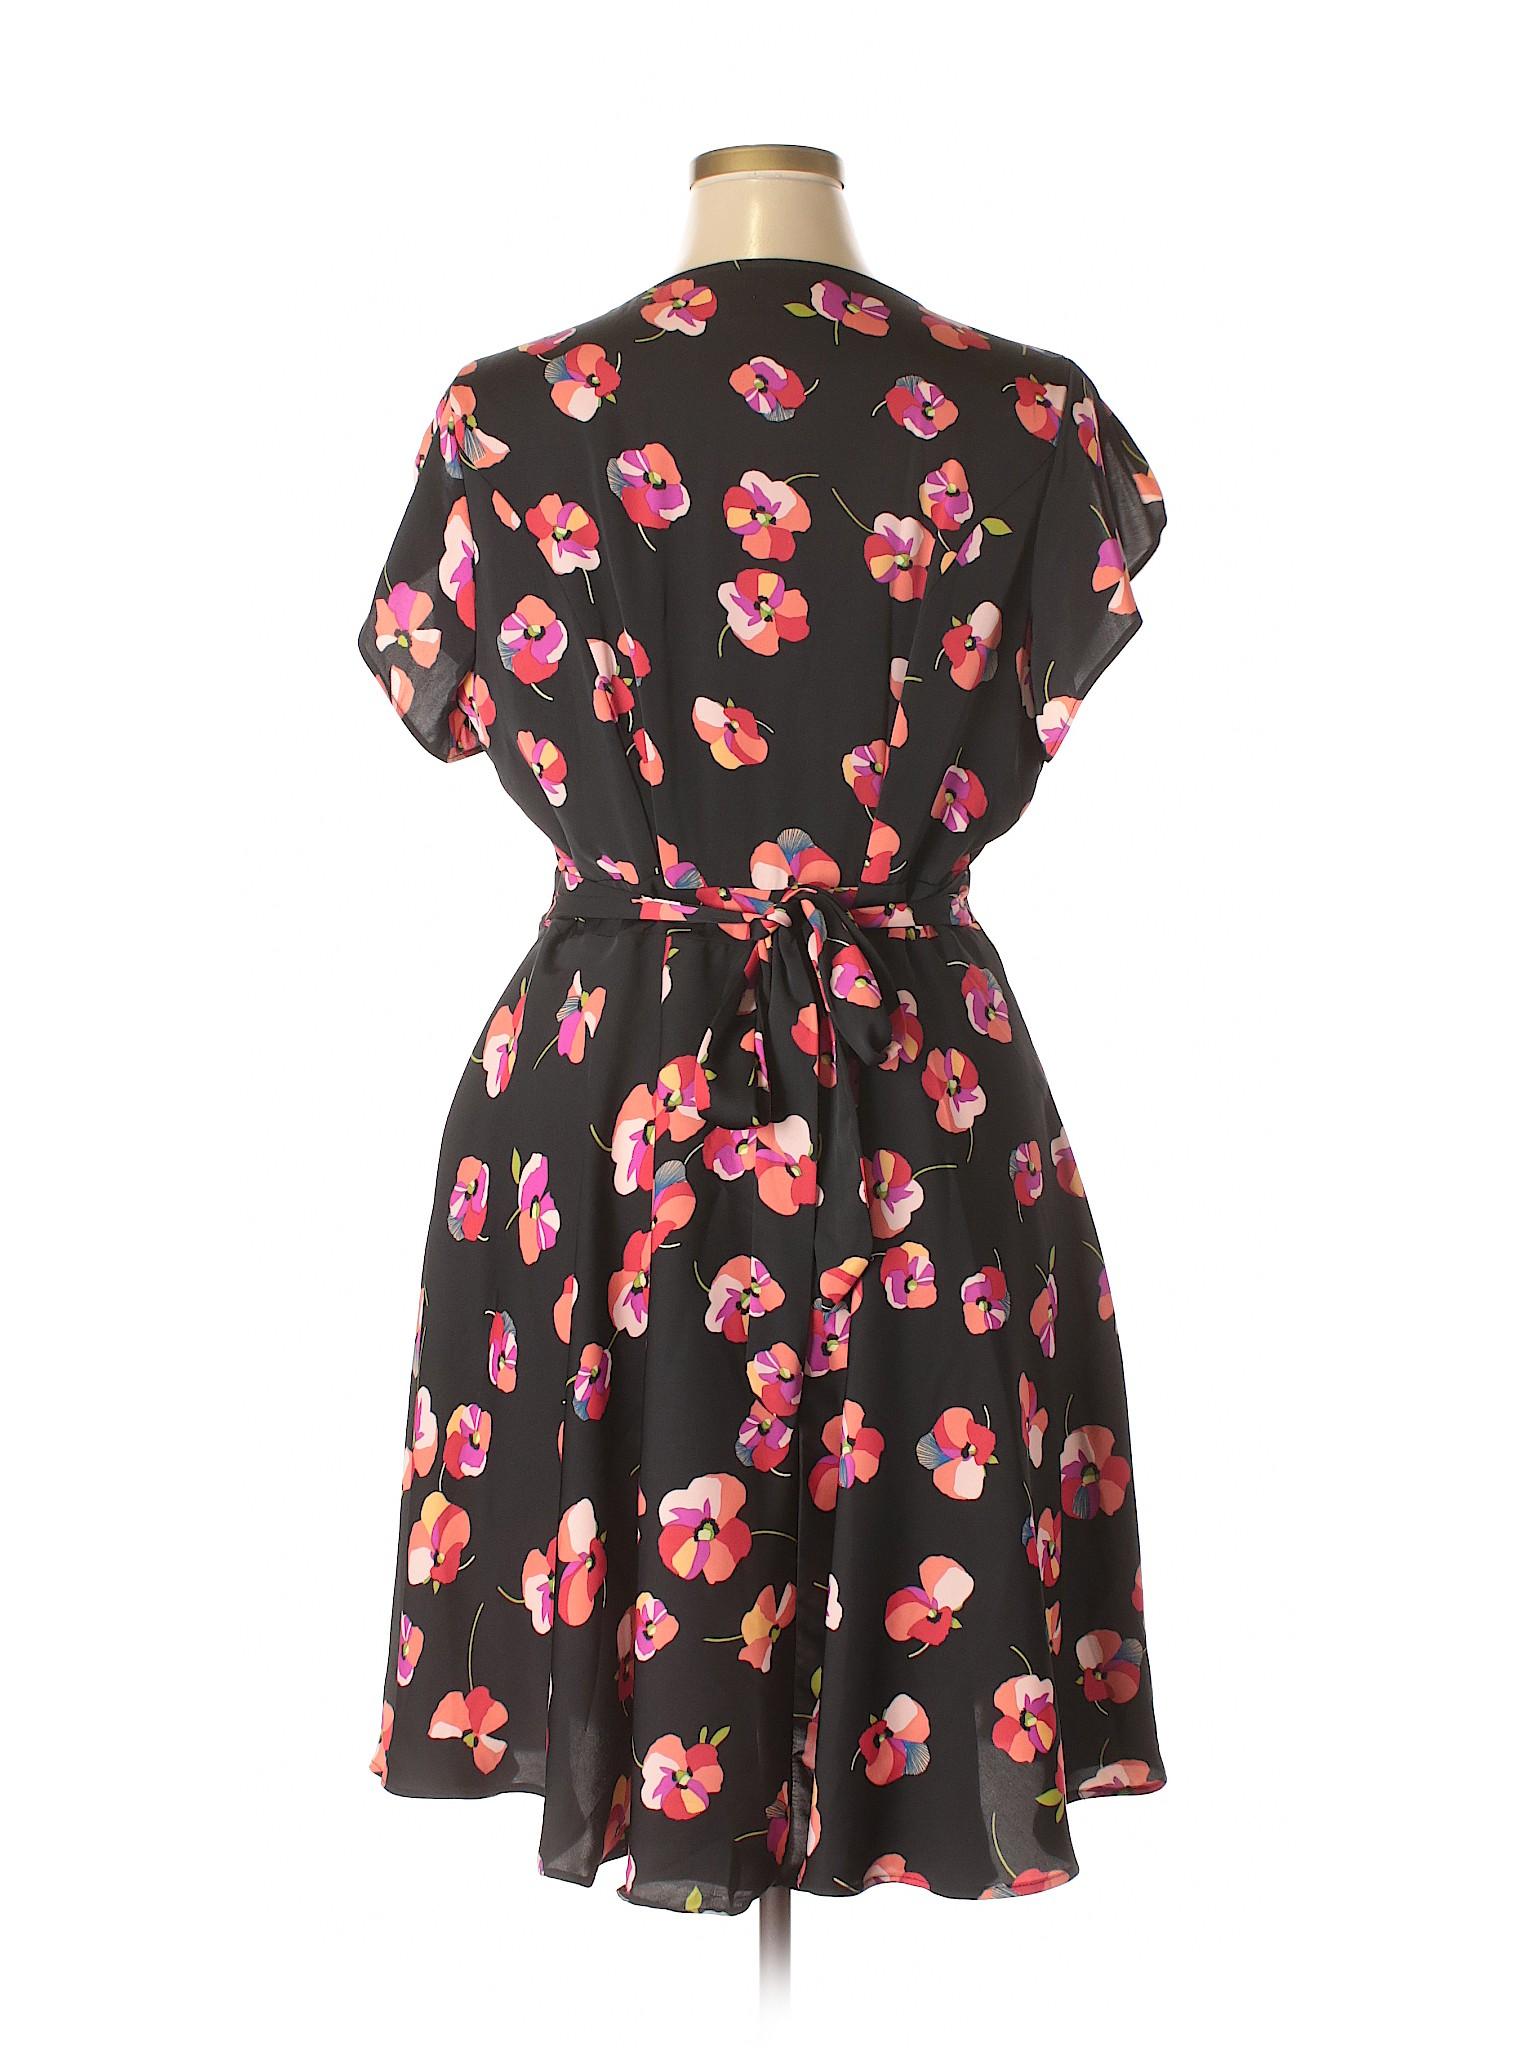 Chic Boutique winter City Dress Casual qgWEgTxn8r